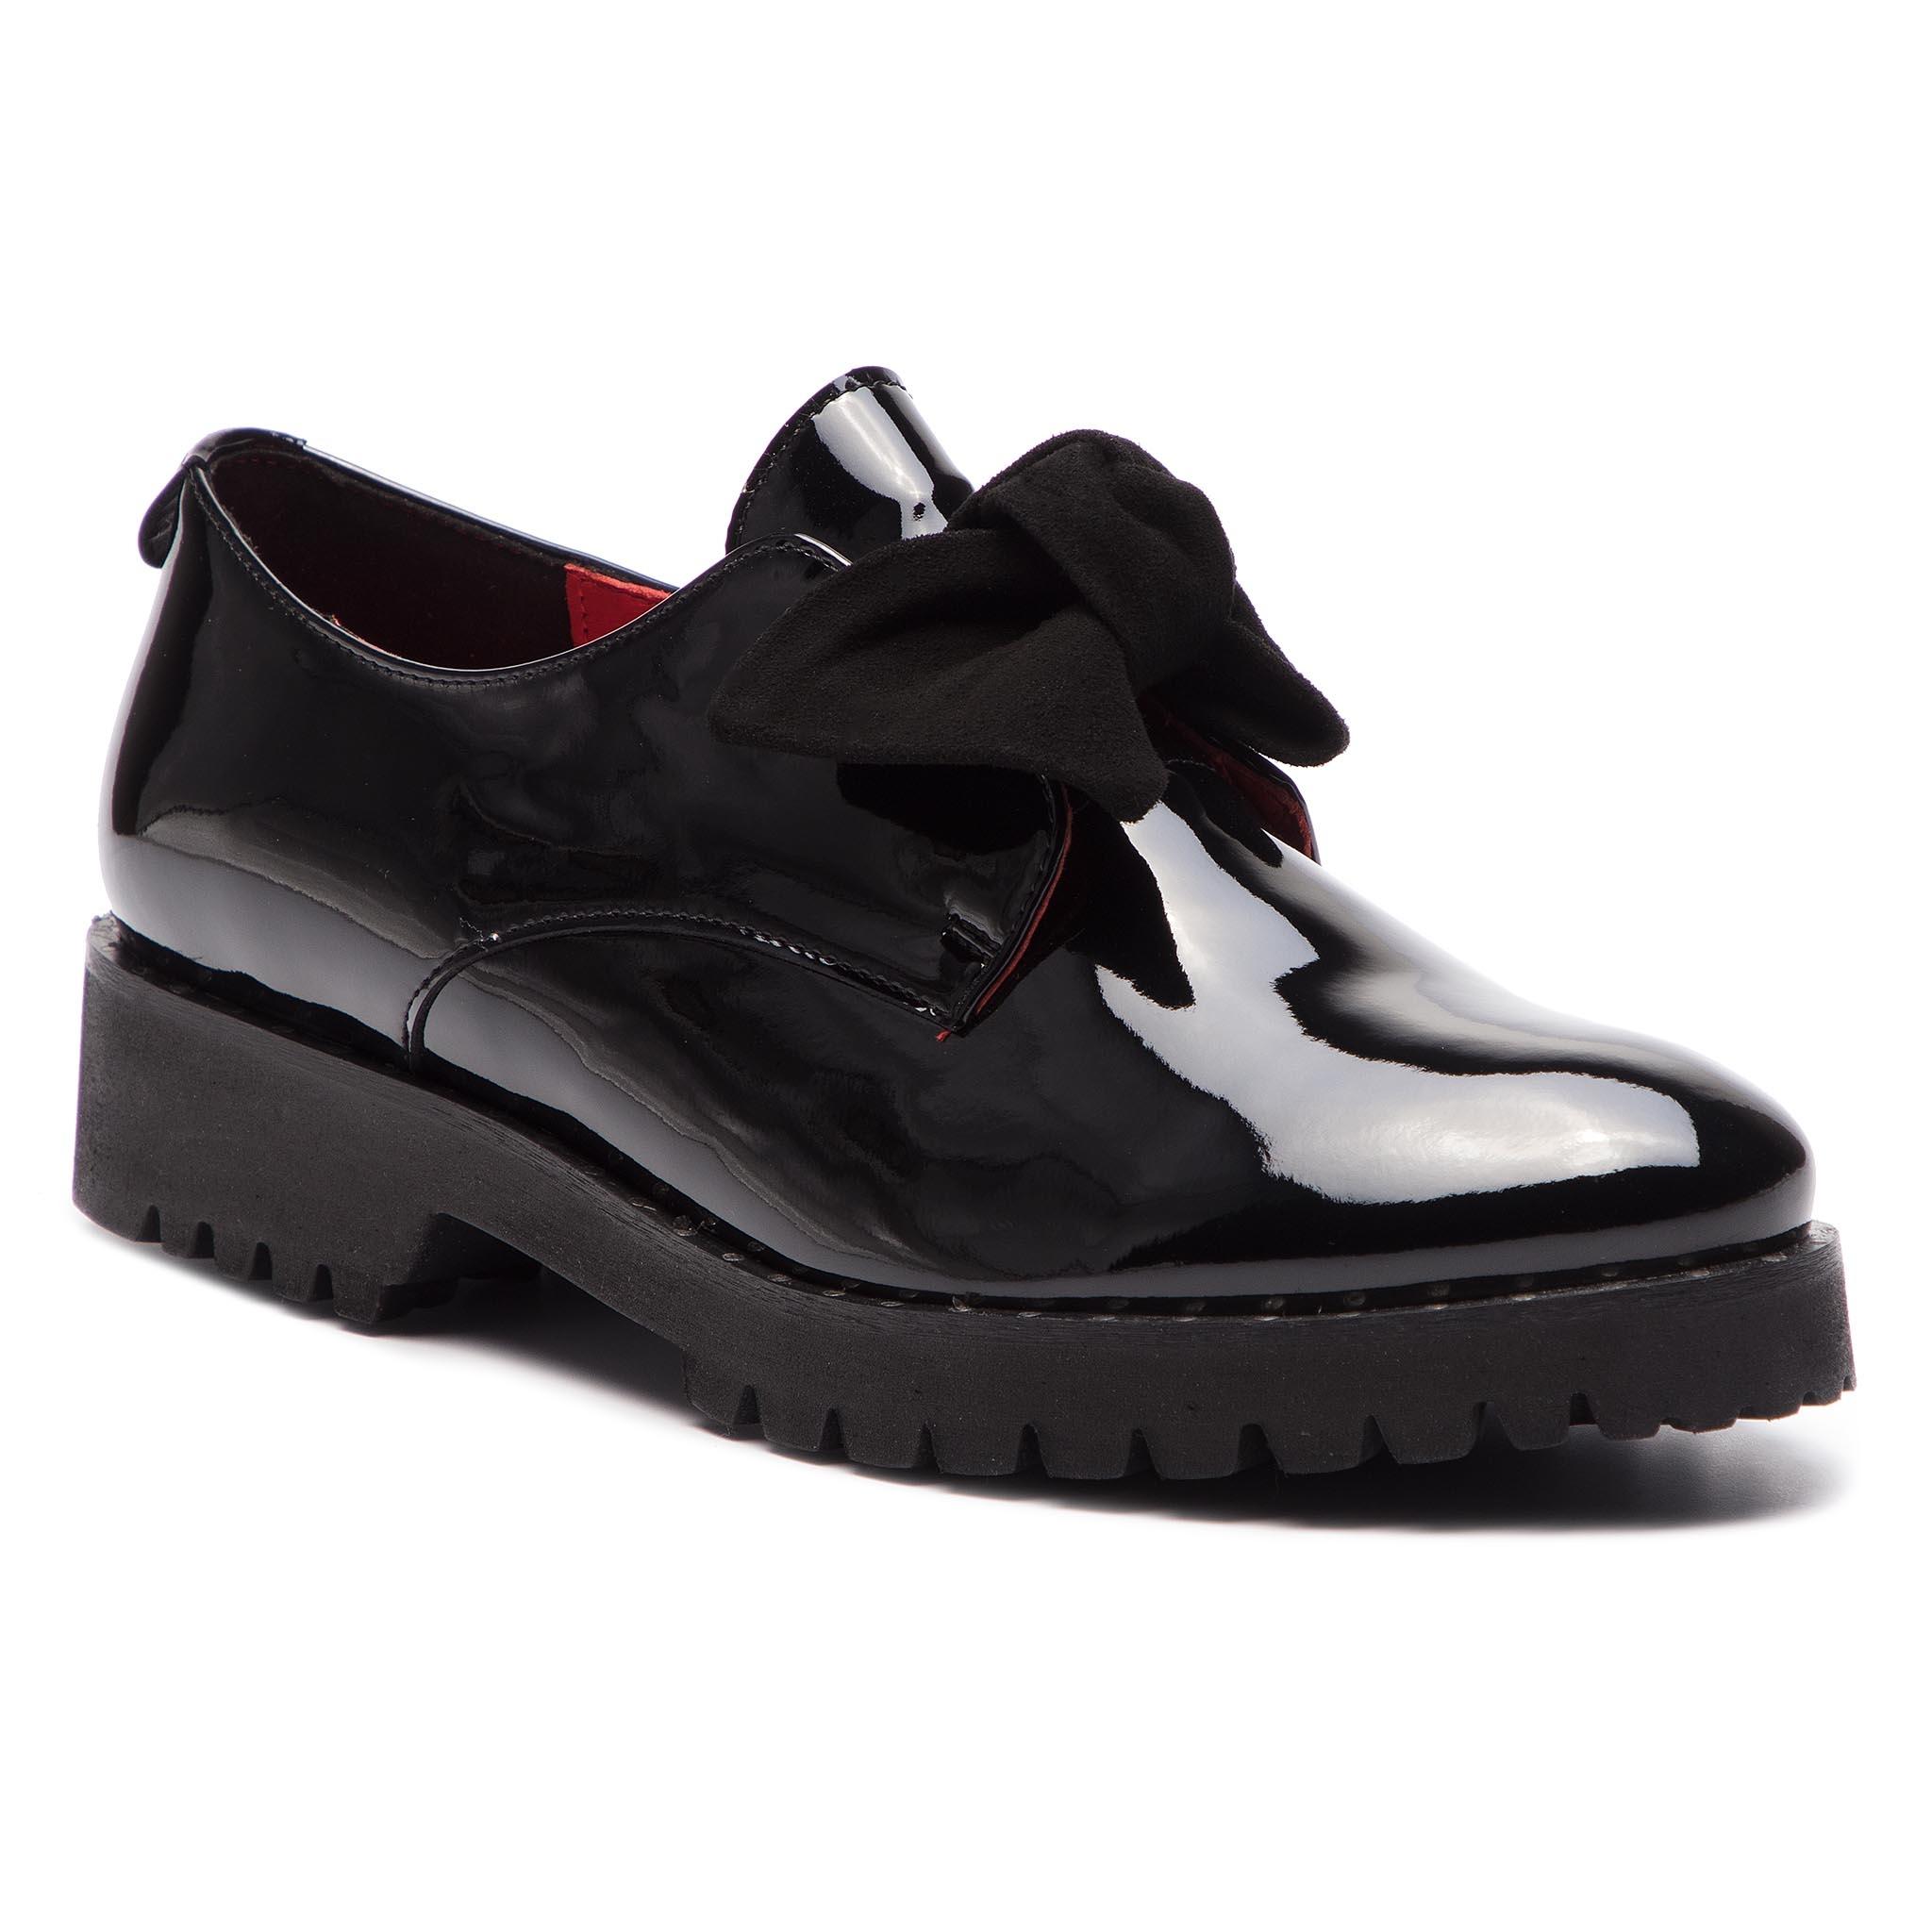 24bce4e2c2 Oxford cipők KARINO - 2956/090-P Fekete - Glami.hu